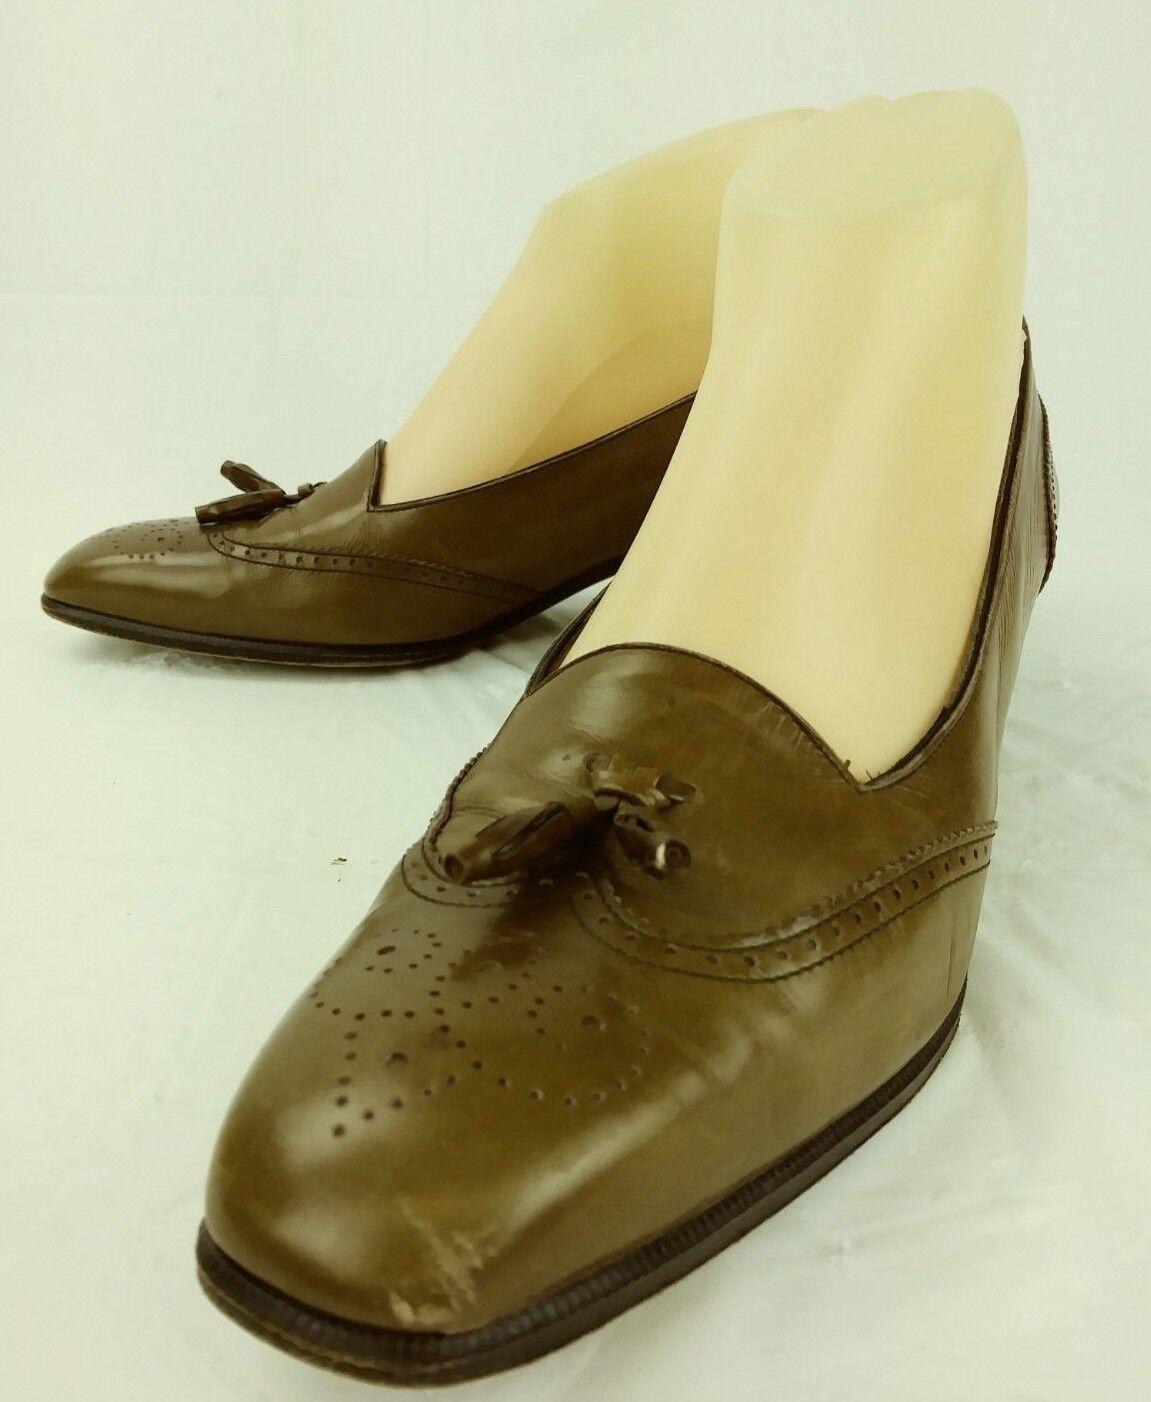 Salvatore Ferragamo Wos Loafer Heels US 9 AAA marron Leather Wing Tip Tassels 287